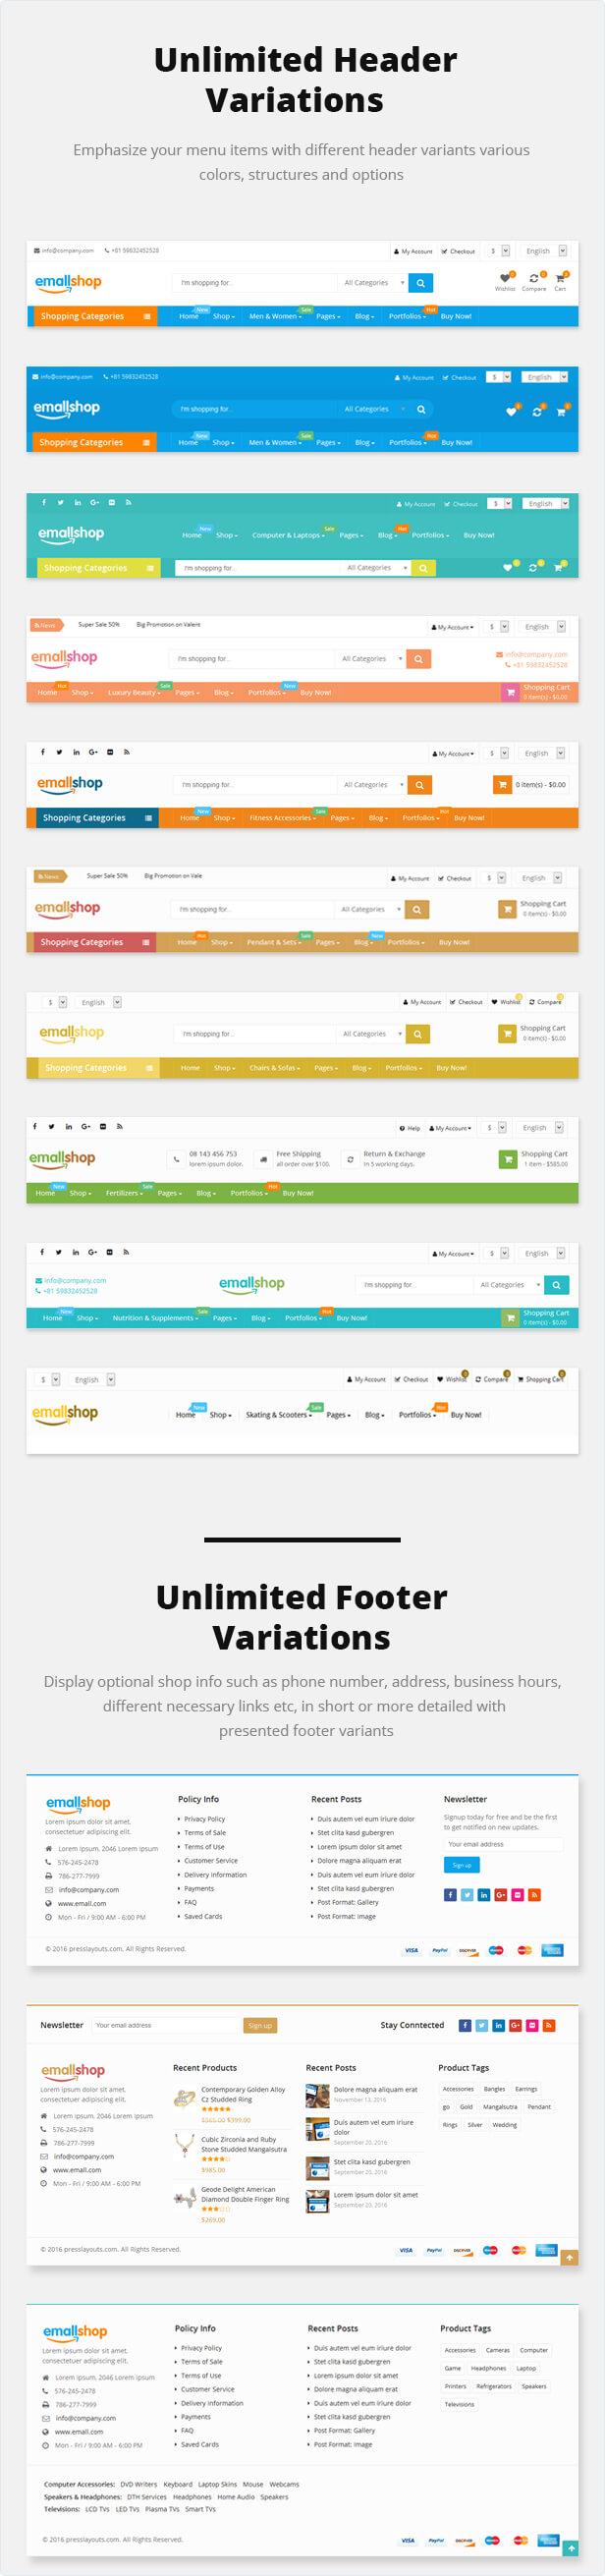 marketing img2 - EmallShop - Responsive WooCommerce WordPress Theme